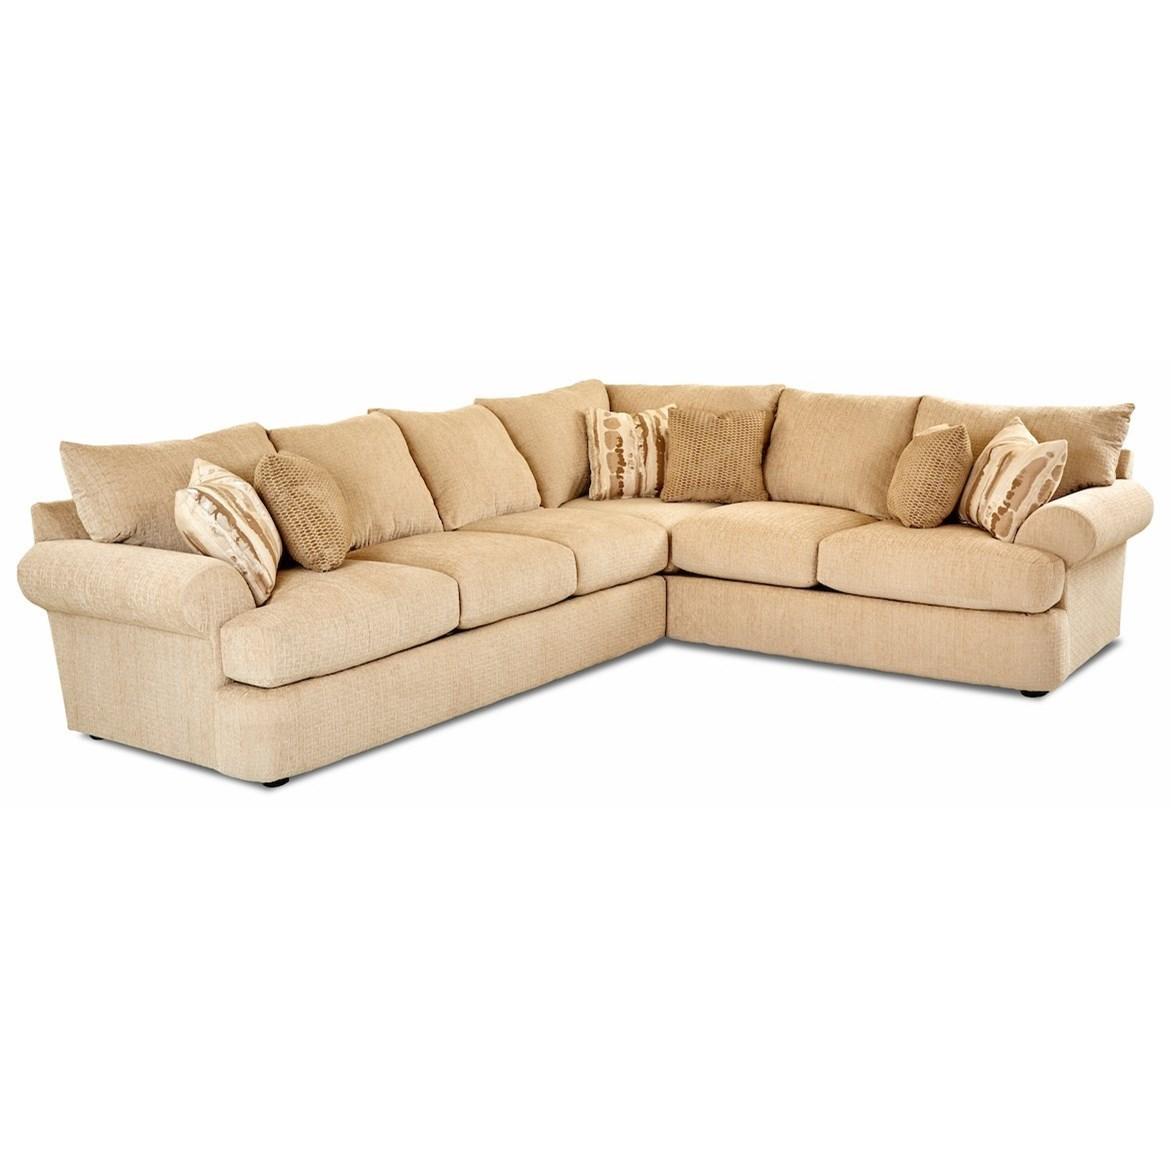 2 Piece Corner Sectional w/ LAF sofa